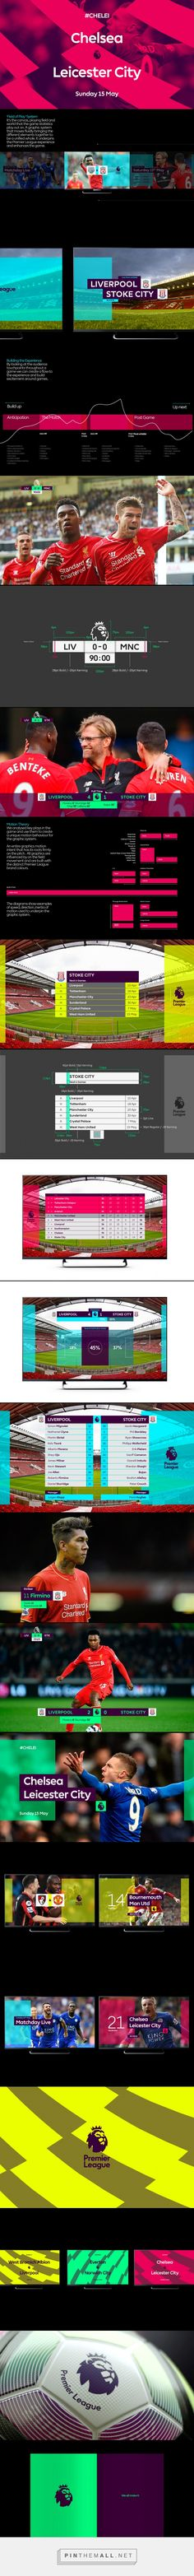 Premier League | DixonBaxi | Brand and Creative Agency - created via…